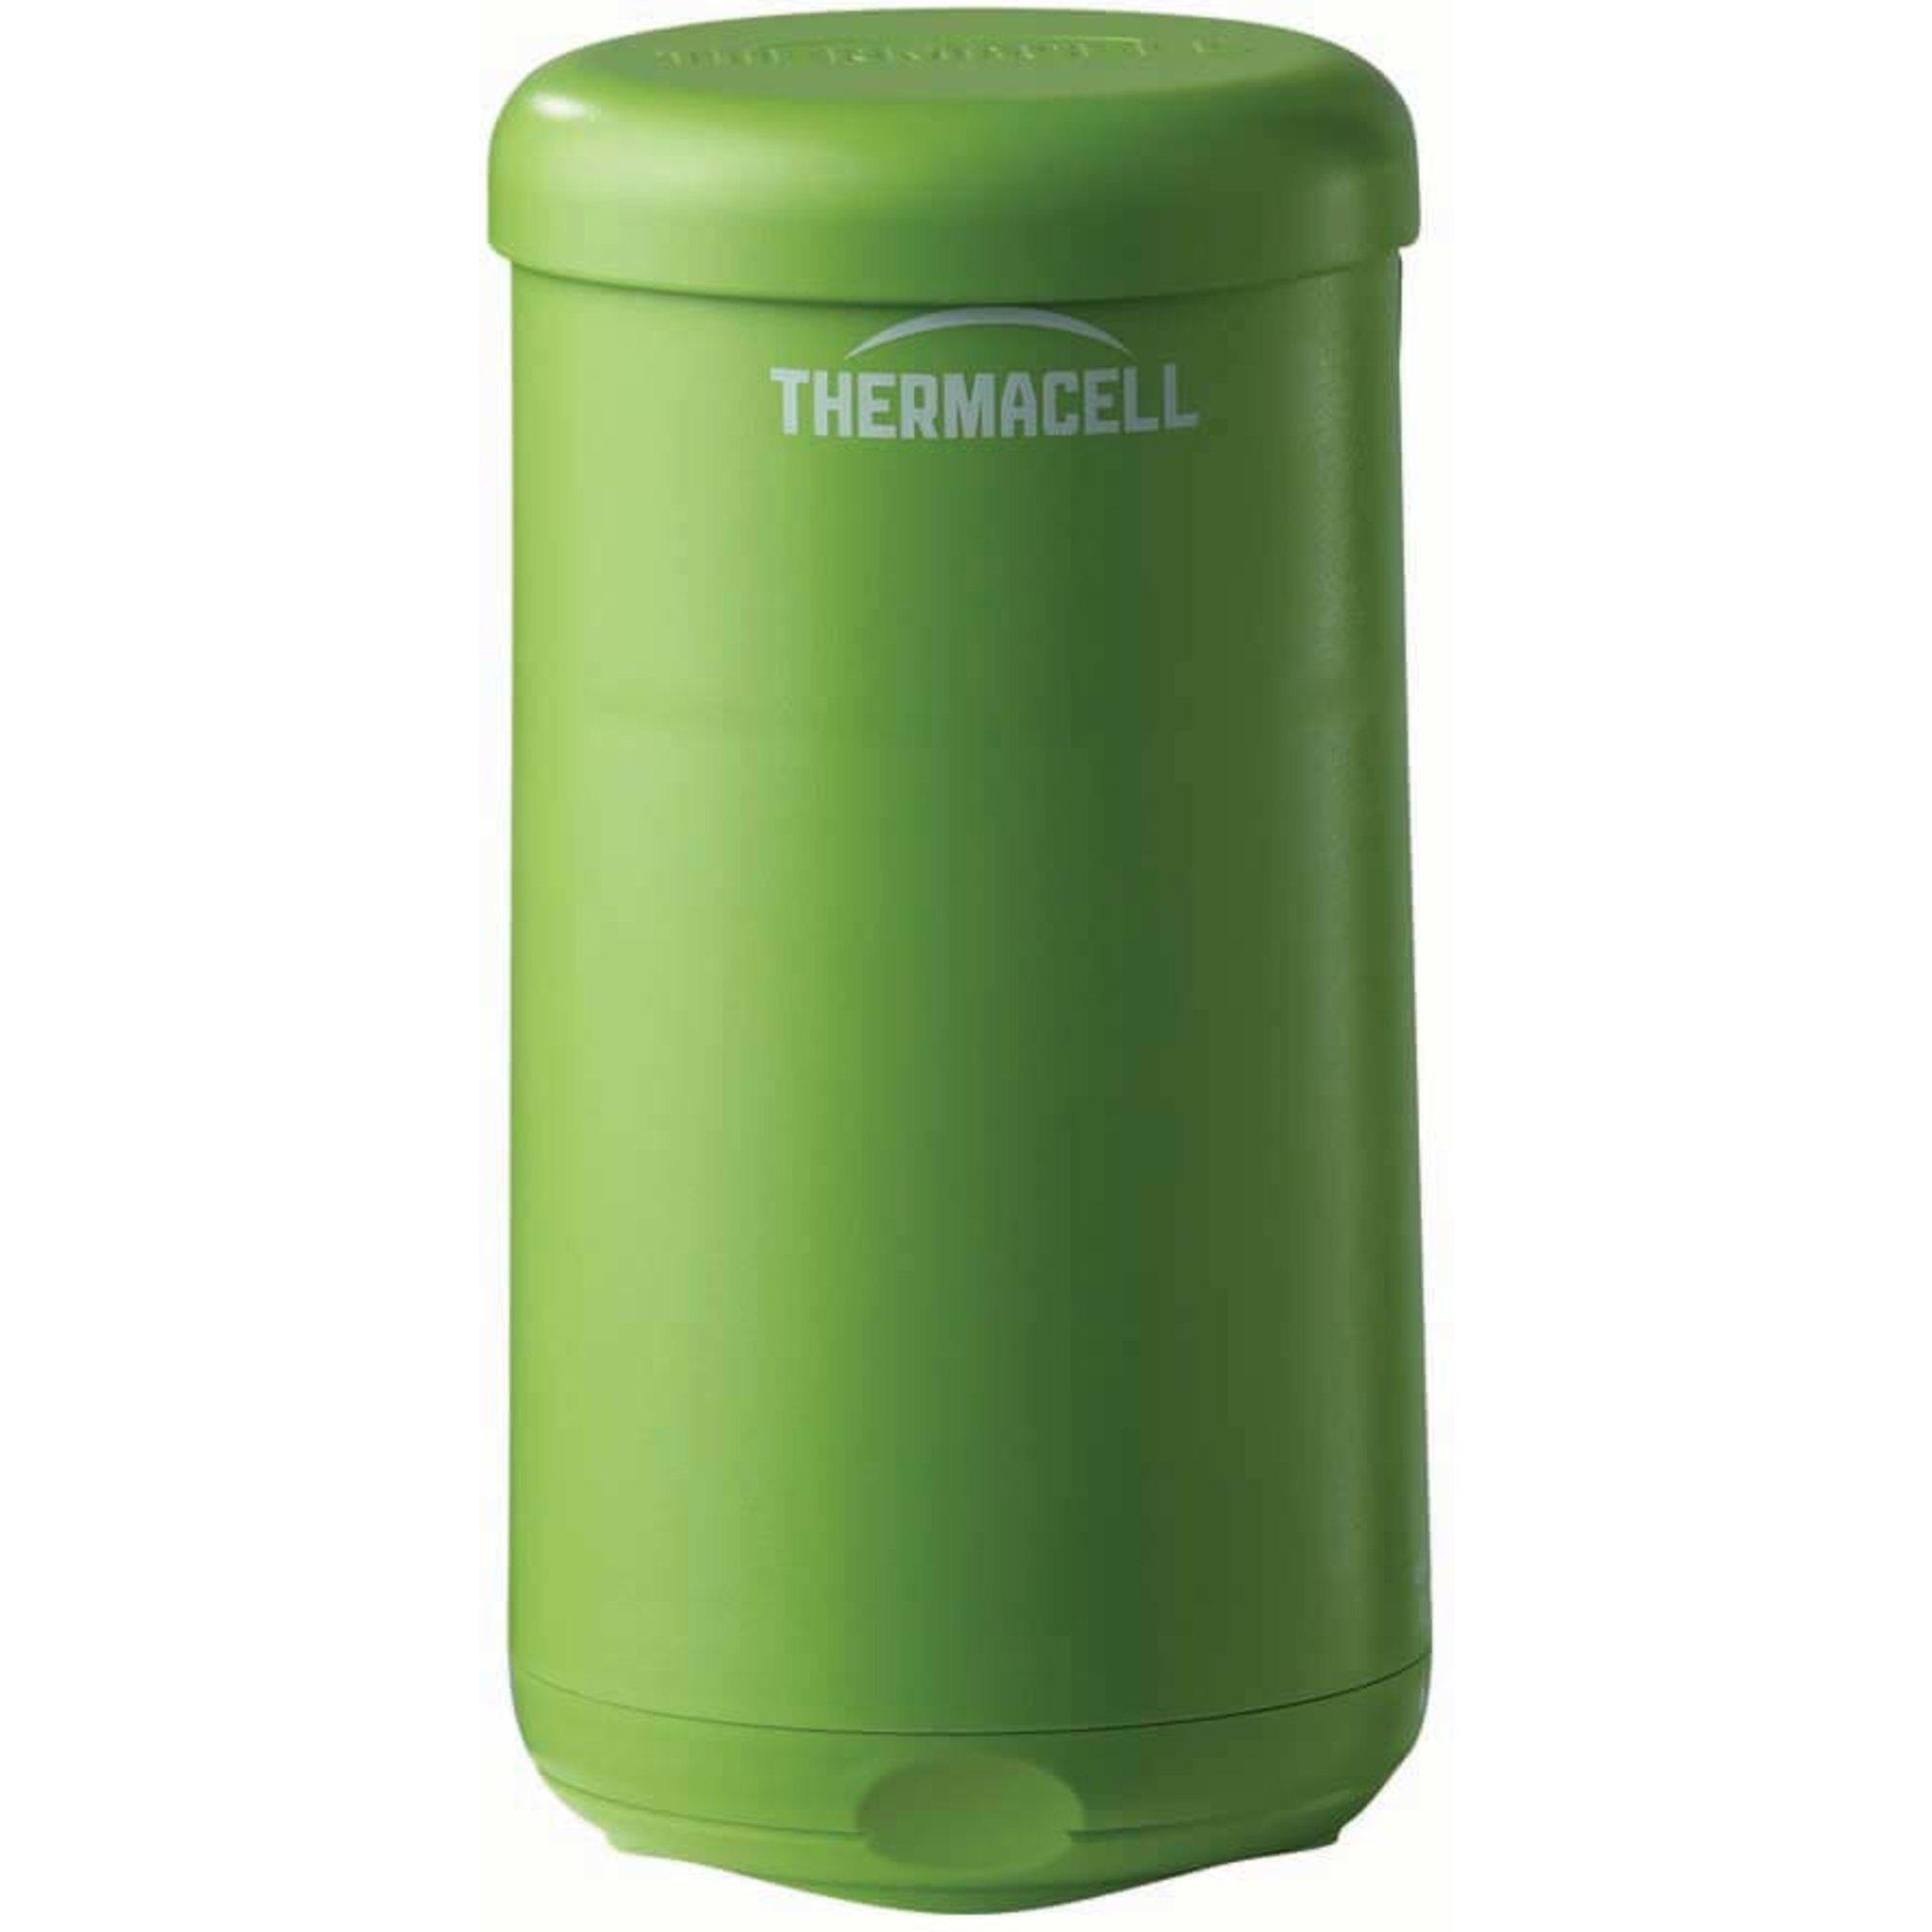 Thermacell Myggskydd Halo Mini Grön